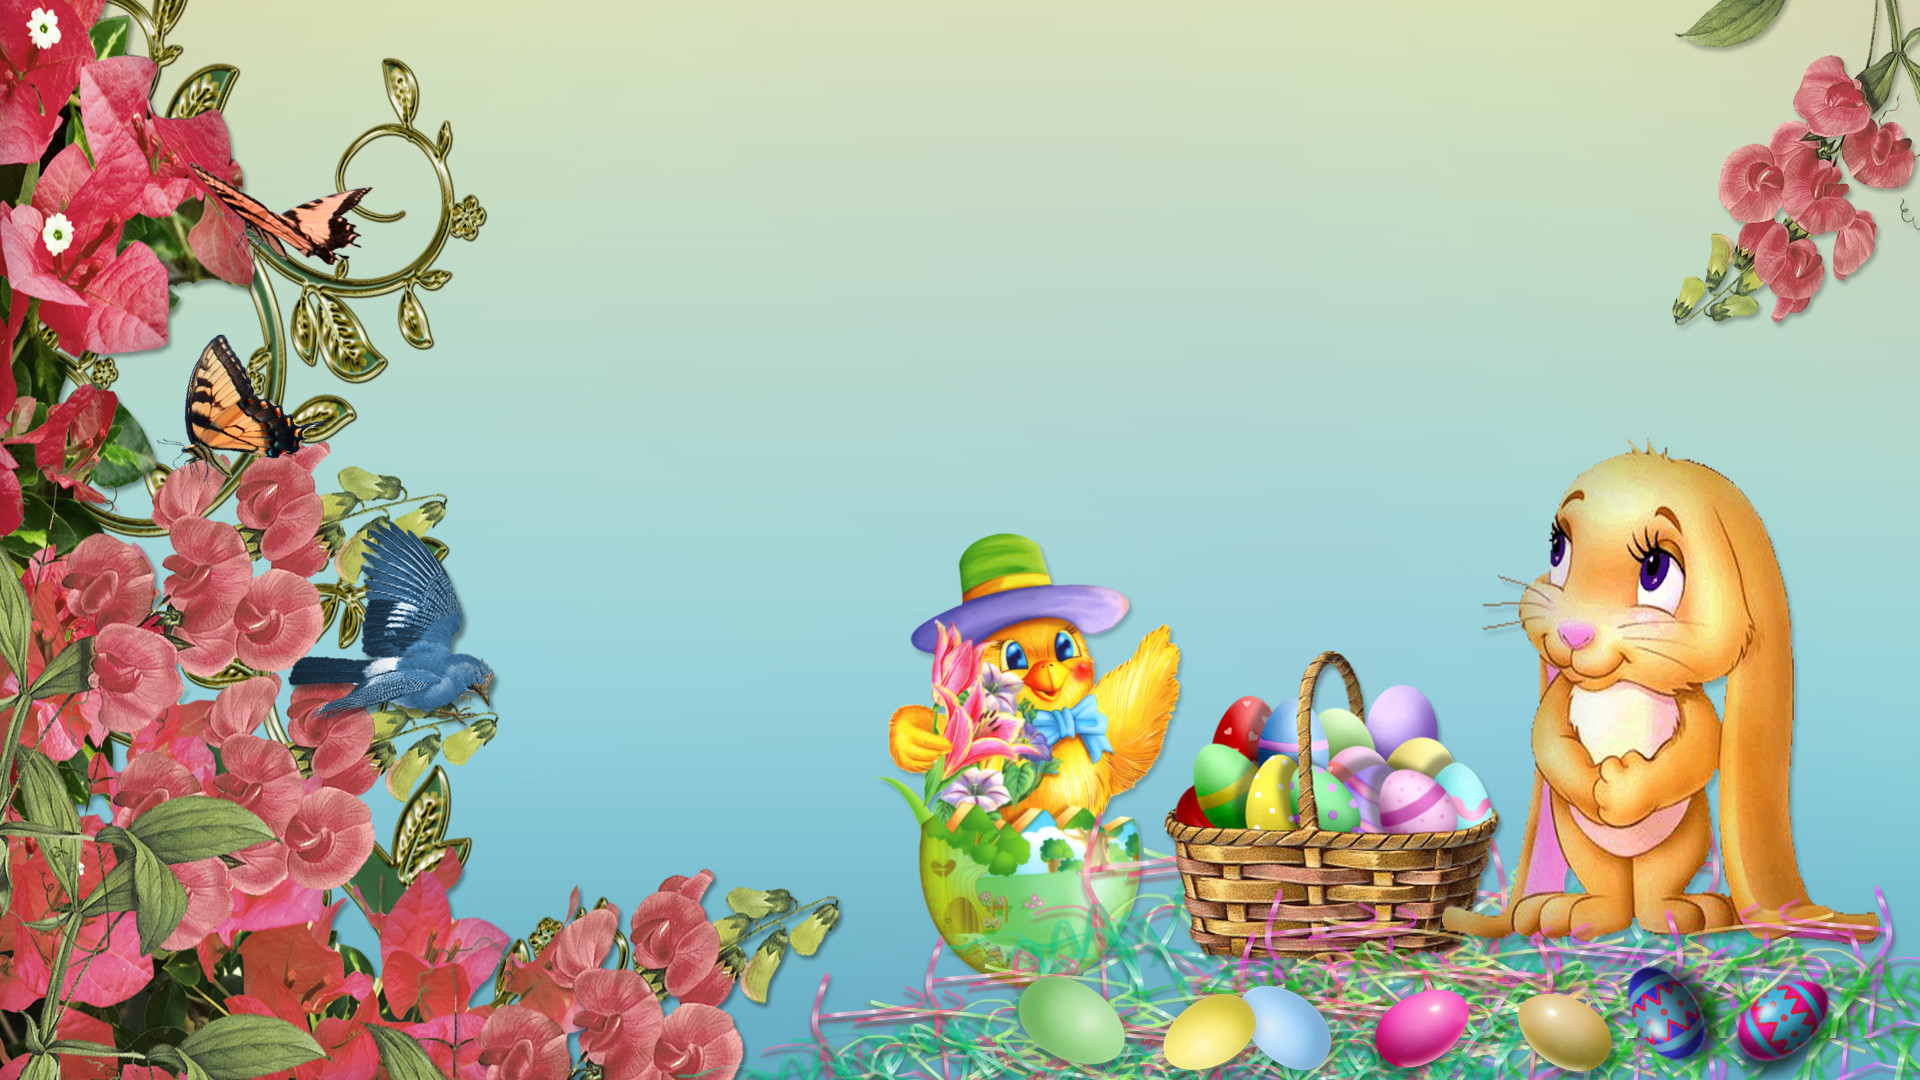 Easter Desktop Backgrounds Collection 14